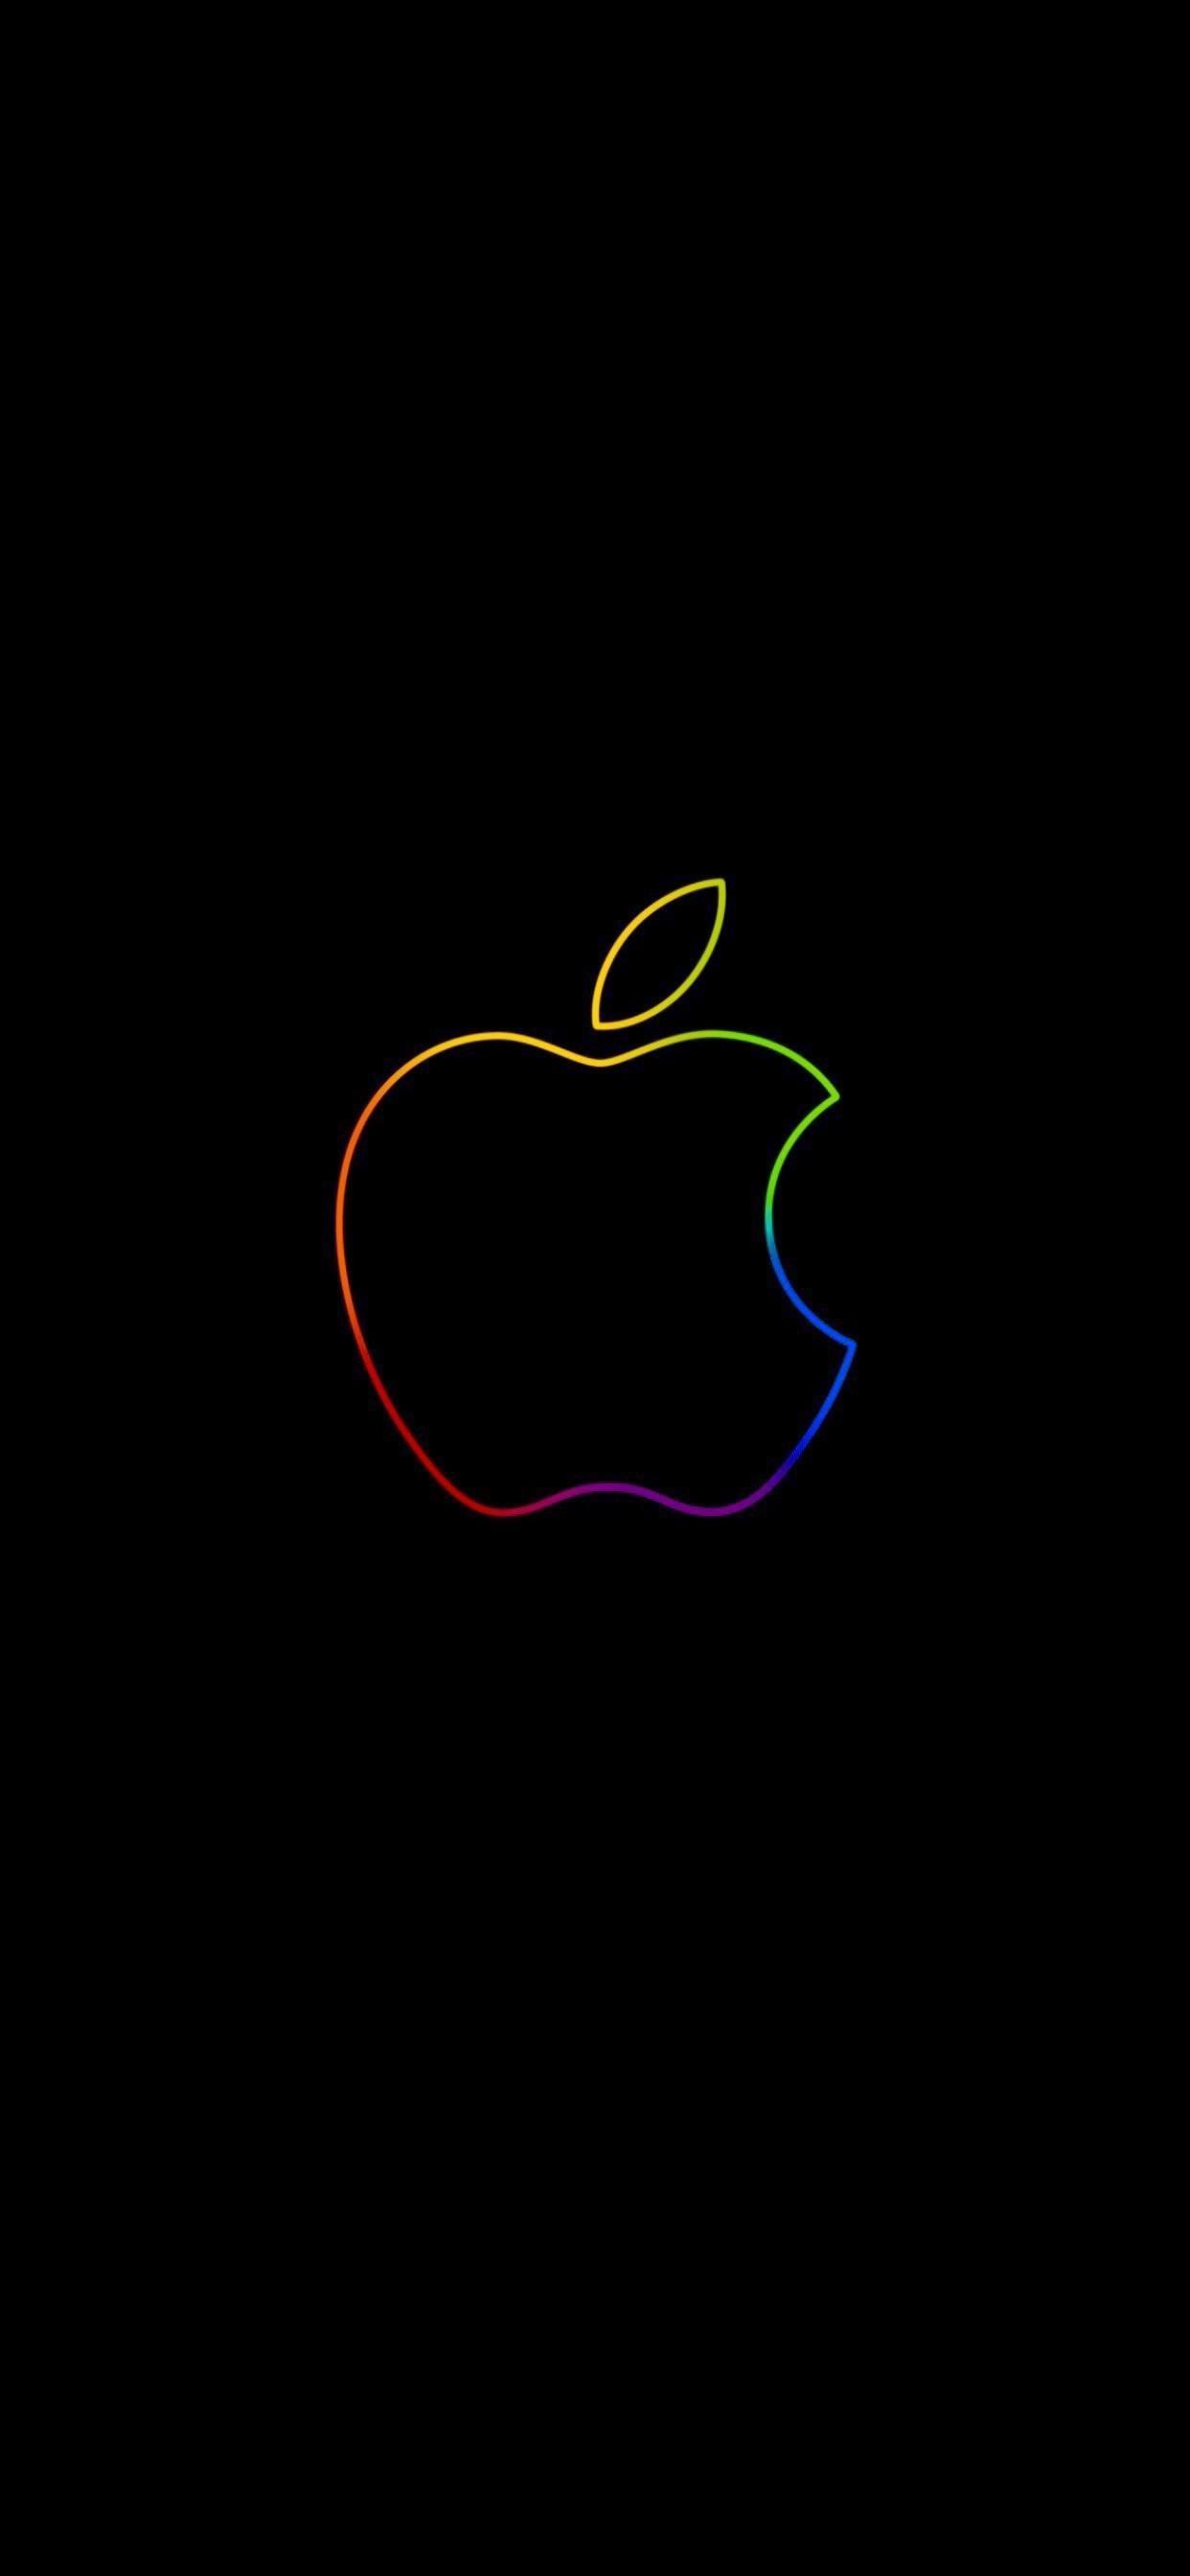 Apple Logo Neon Applewallpaperiphone Apple Logo Neon Apple Applewallpaperiphone Homeoff In 2020 Iphone Wallpaper Logo Apple Logo Wallpaper Iphone Apple Wallpaper